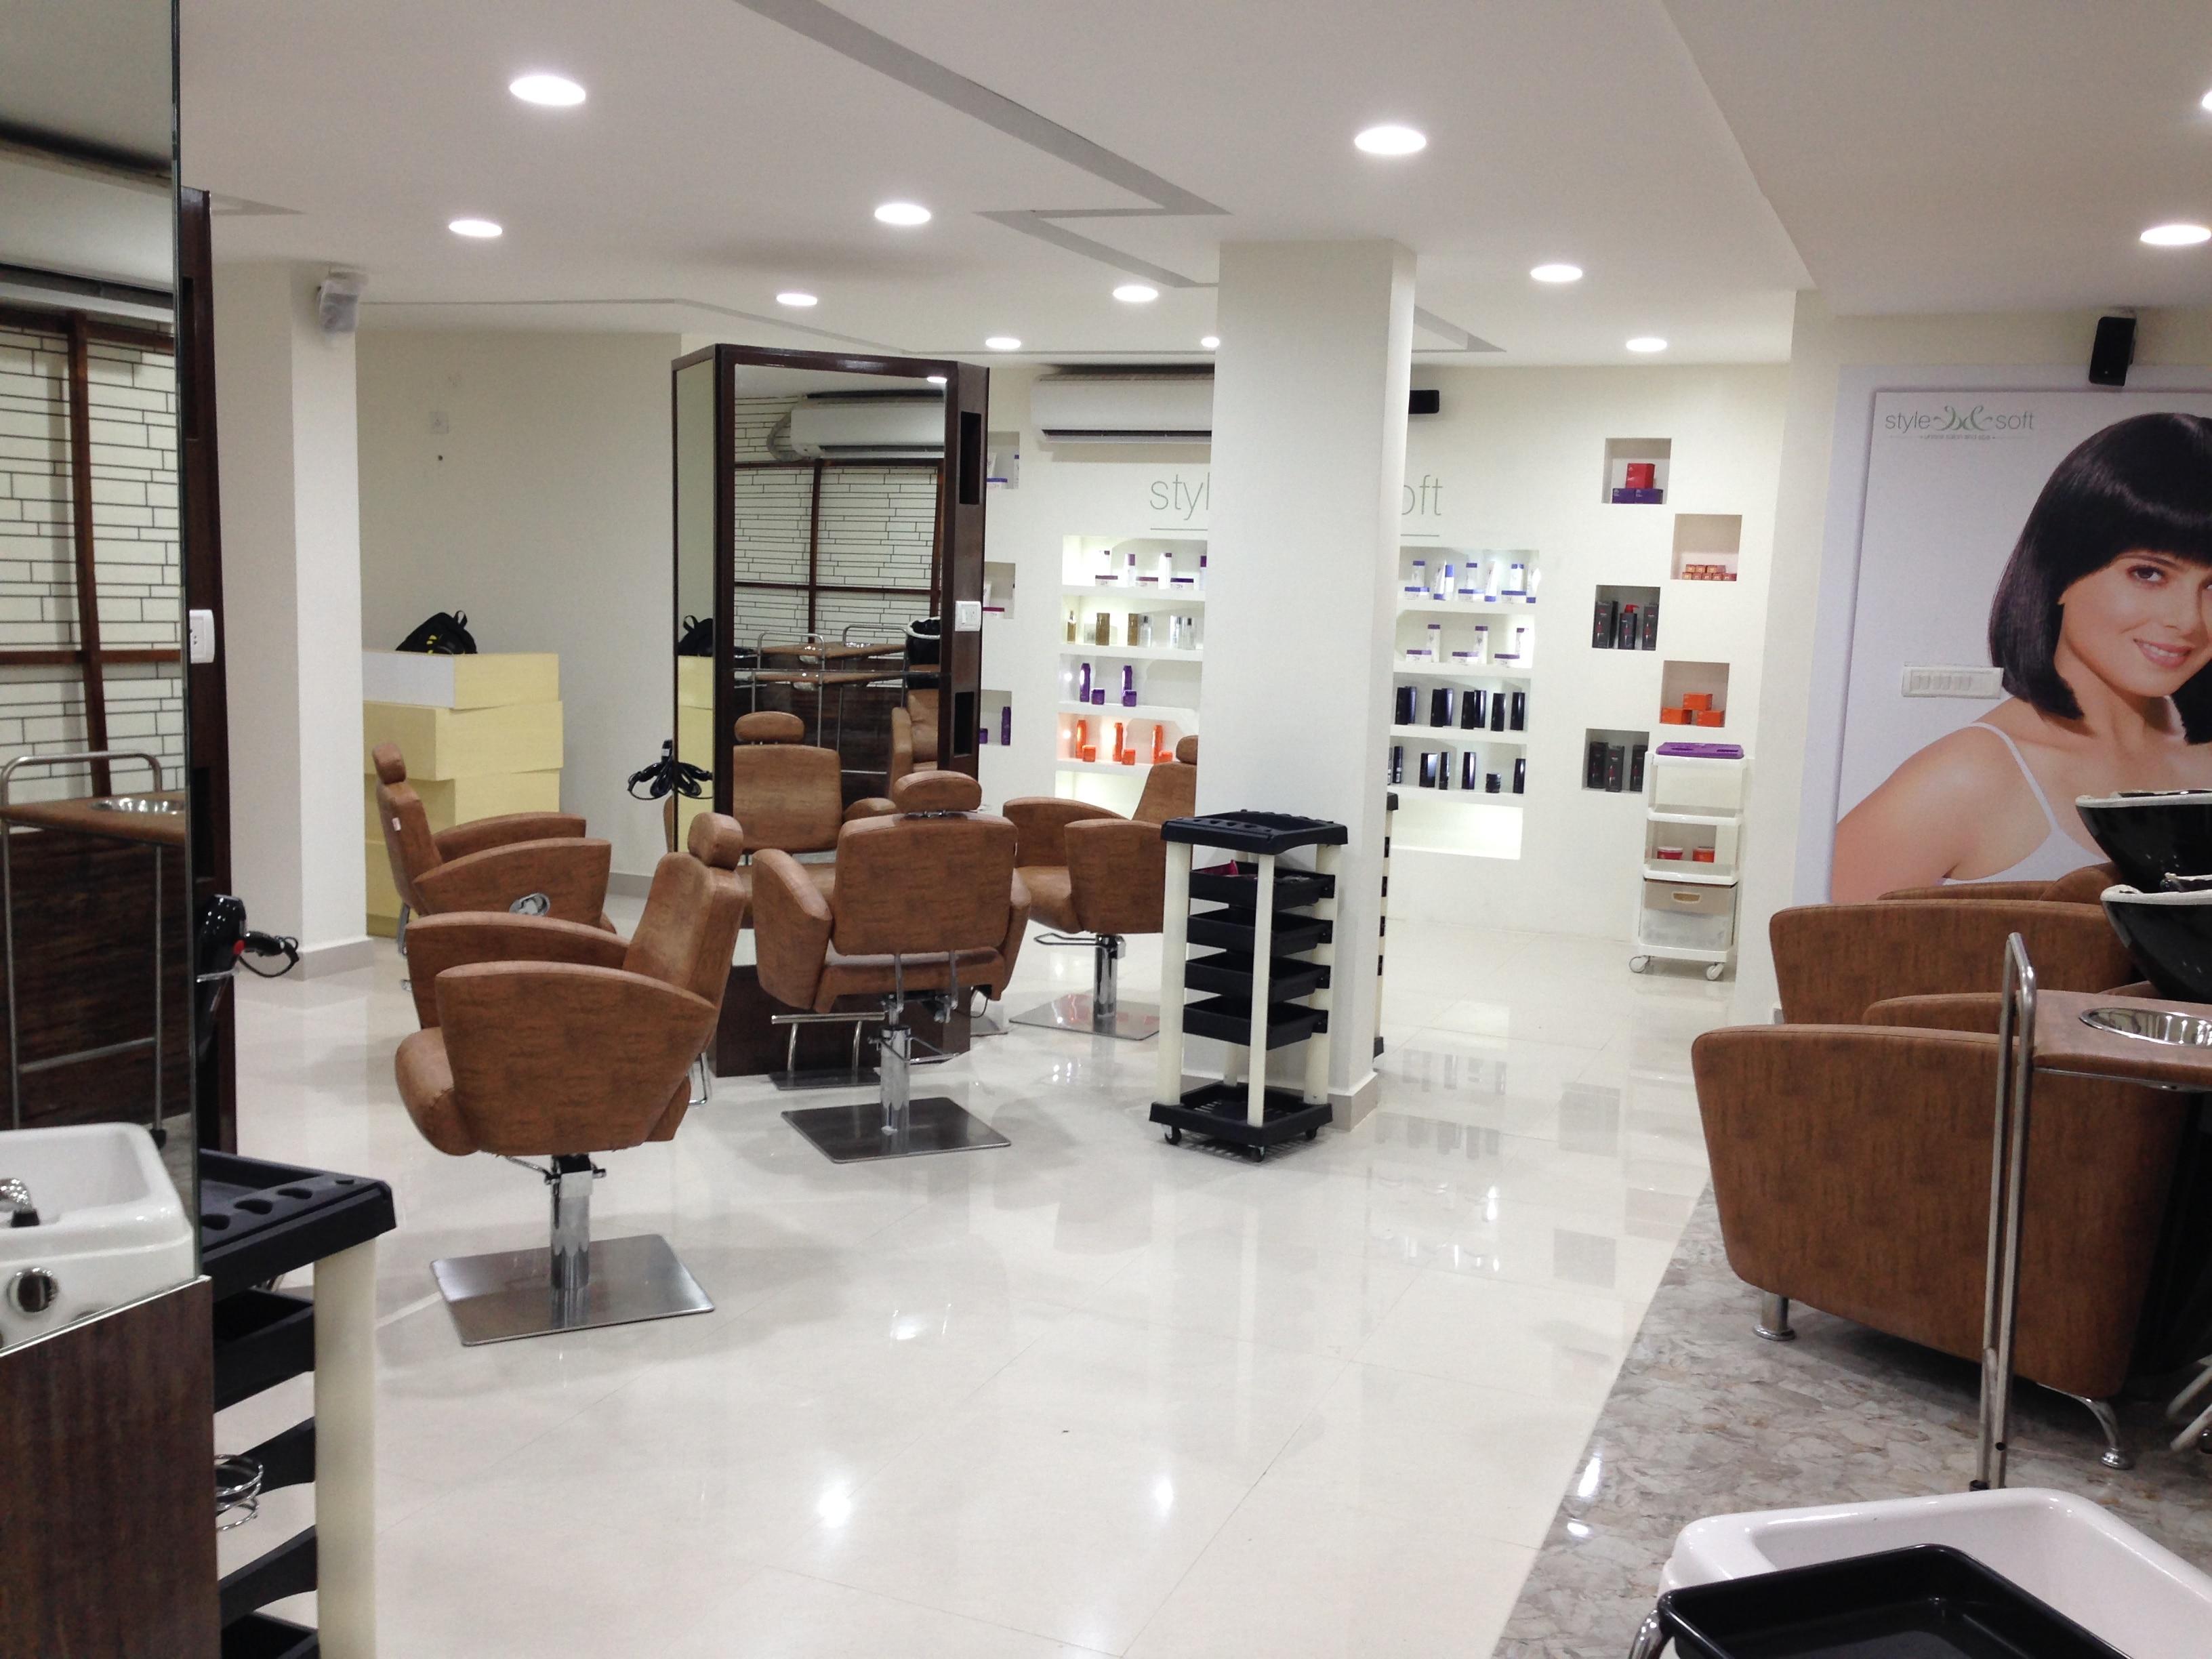 Furniture Arrangement For L Shaped Room Free Home Design Ideas Images